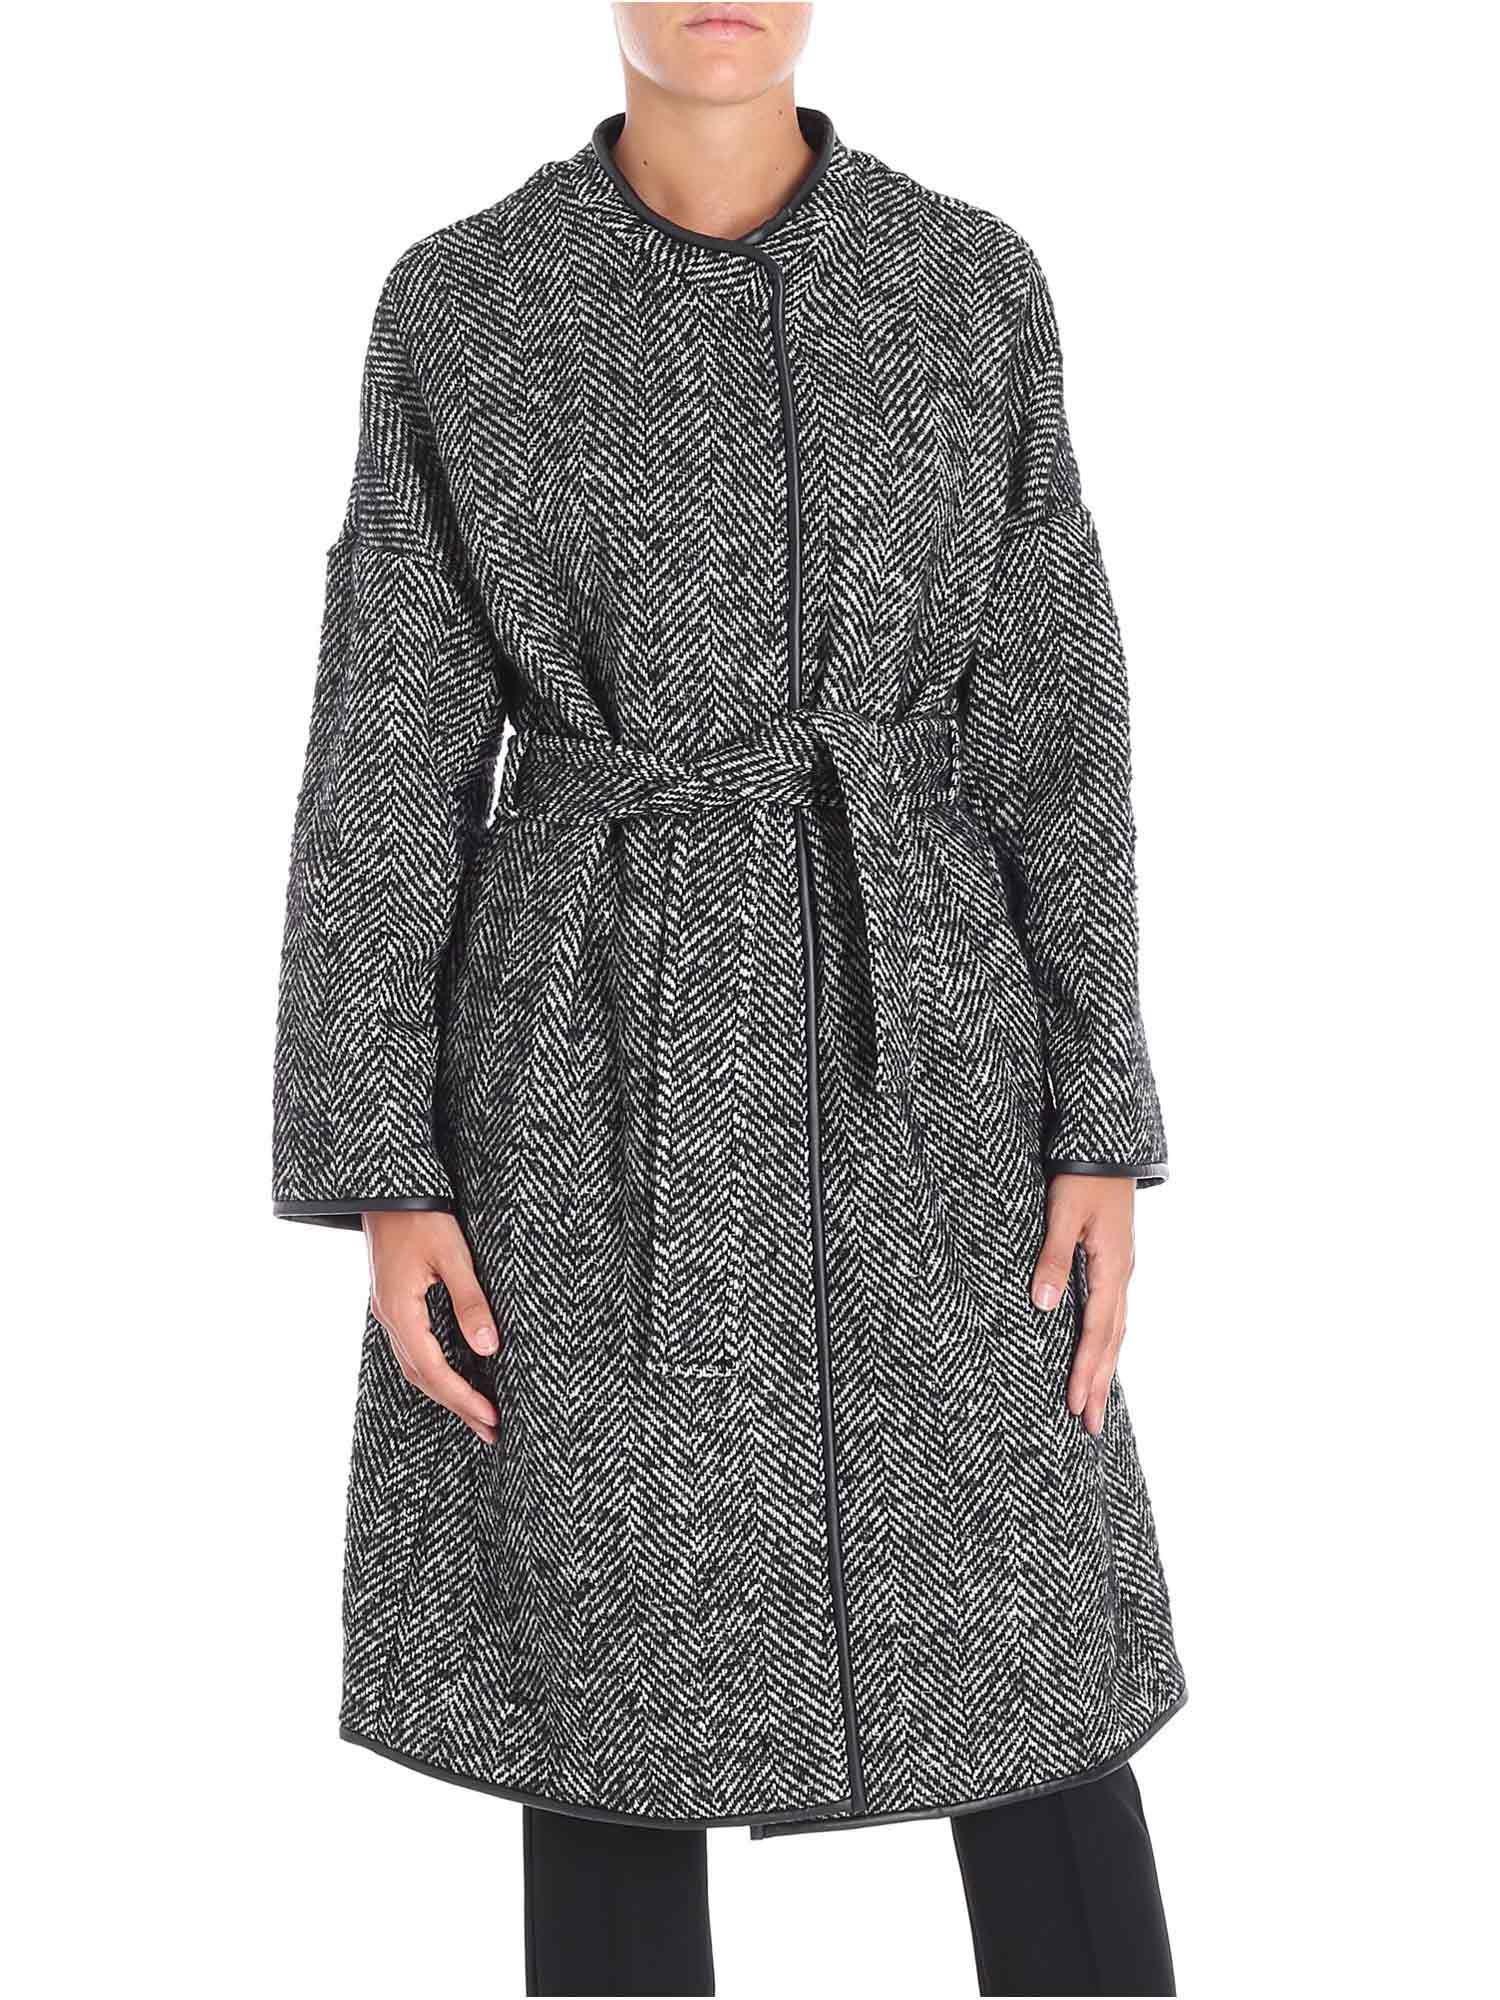 12a24d0d18a Lyst - Pinko Black And White Herringbone Fabric Barile Coat in Black